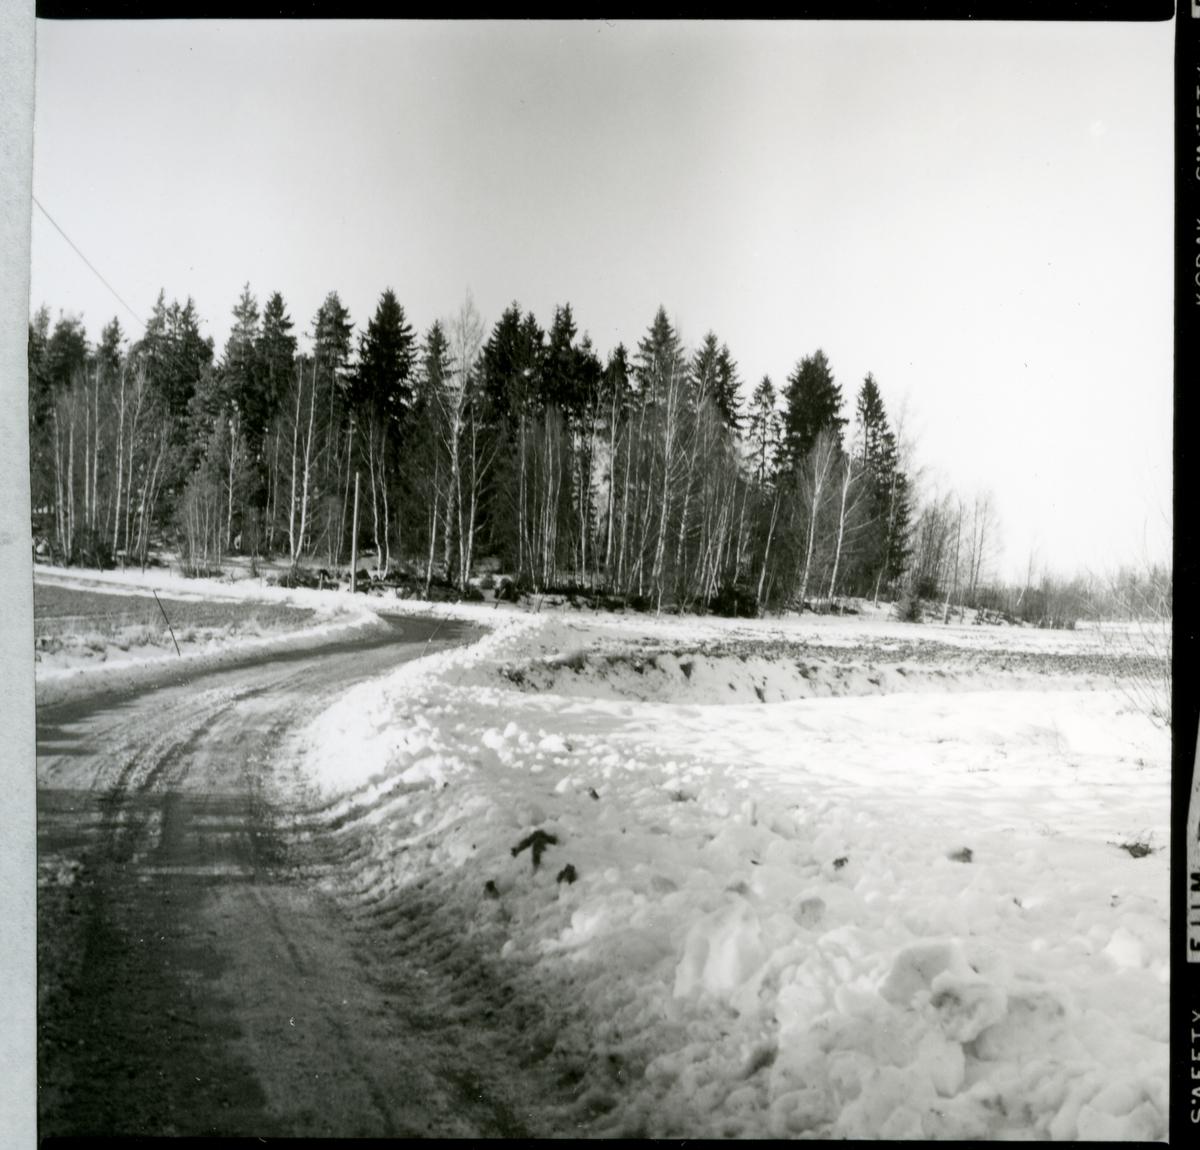 Kung Karl sn, Kungsör. RAÄ 554/71.